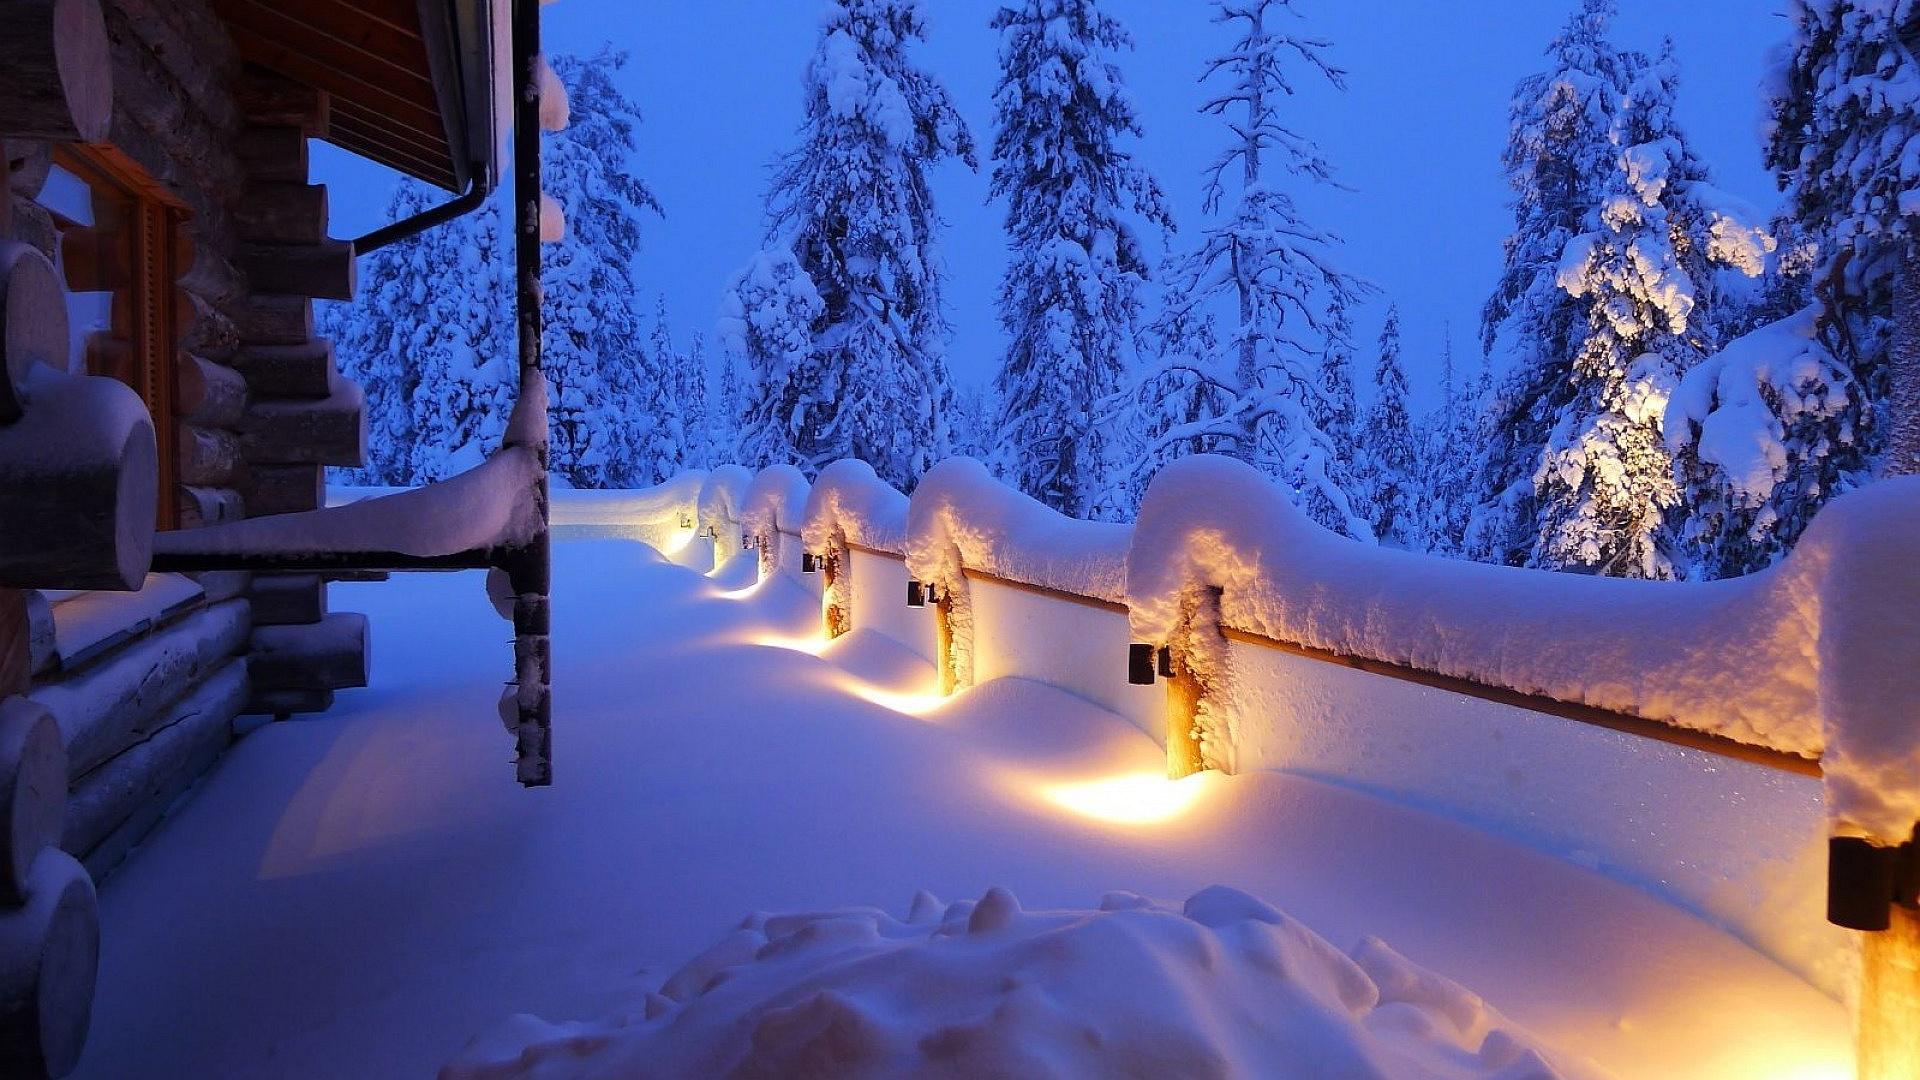 Free Winter Hd Wallpapers Pixelstalk Nature Winter